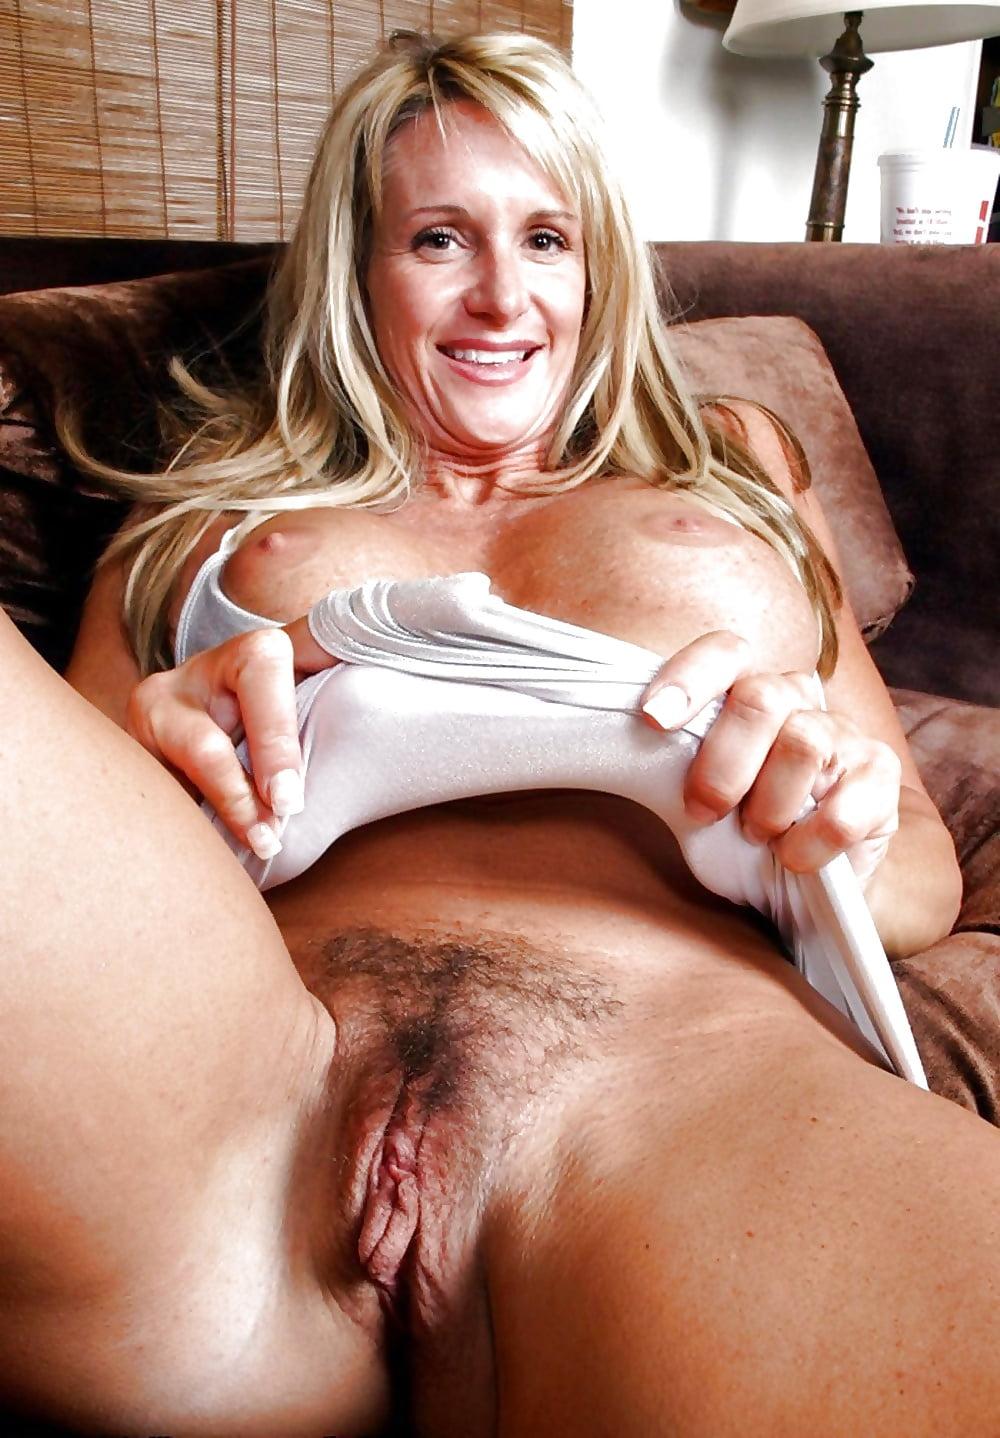 Секс фото распутных дам, порно транс актрисы каталог